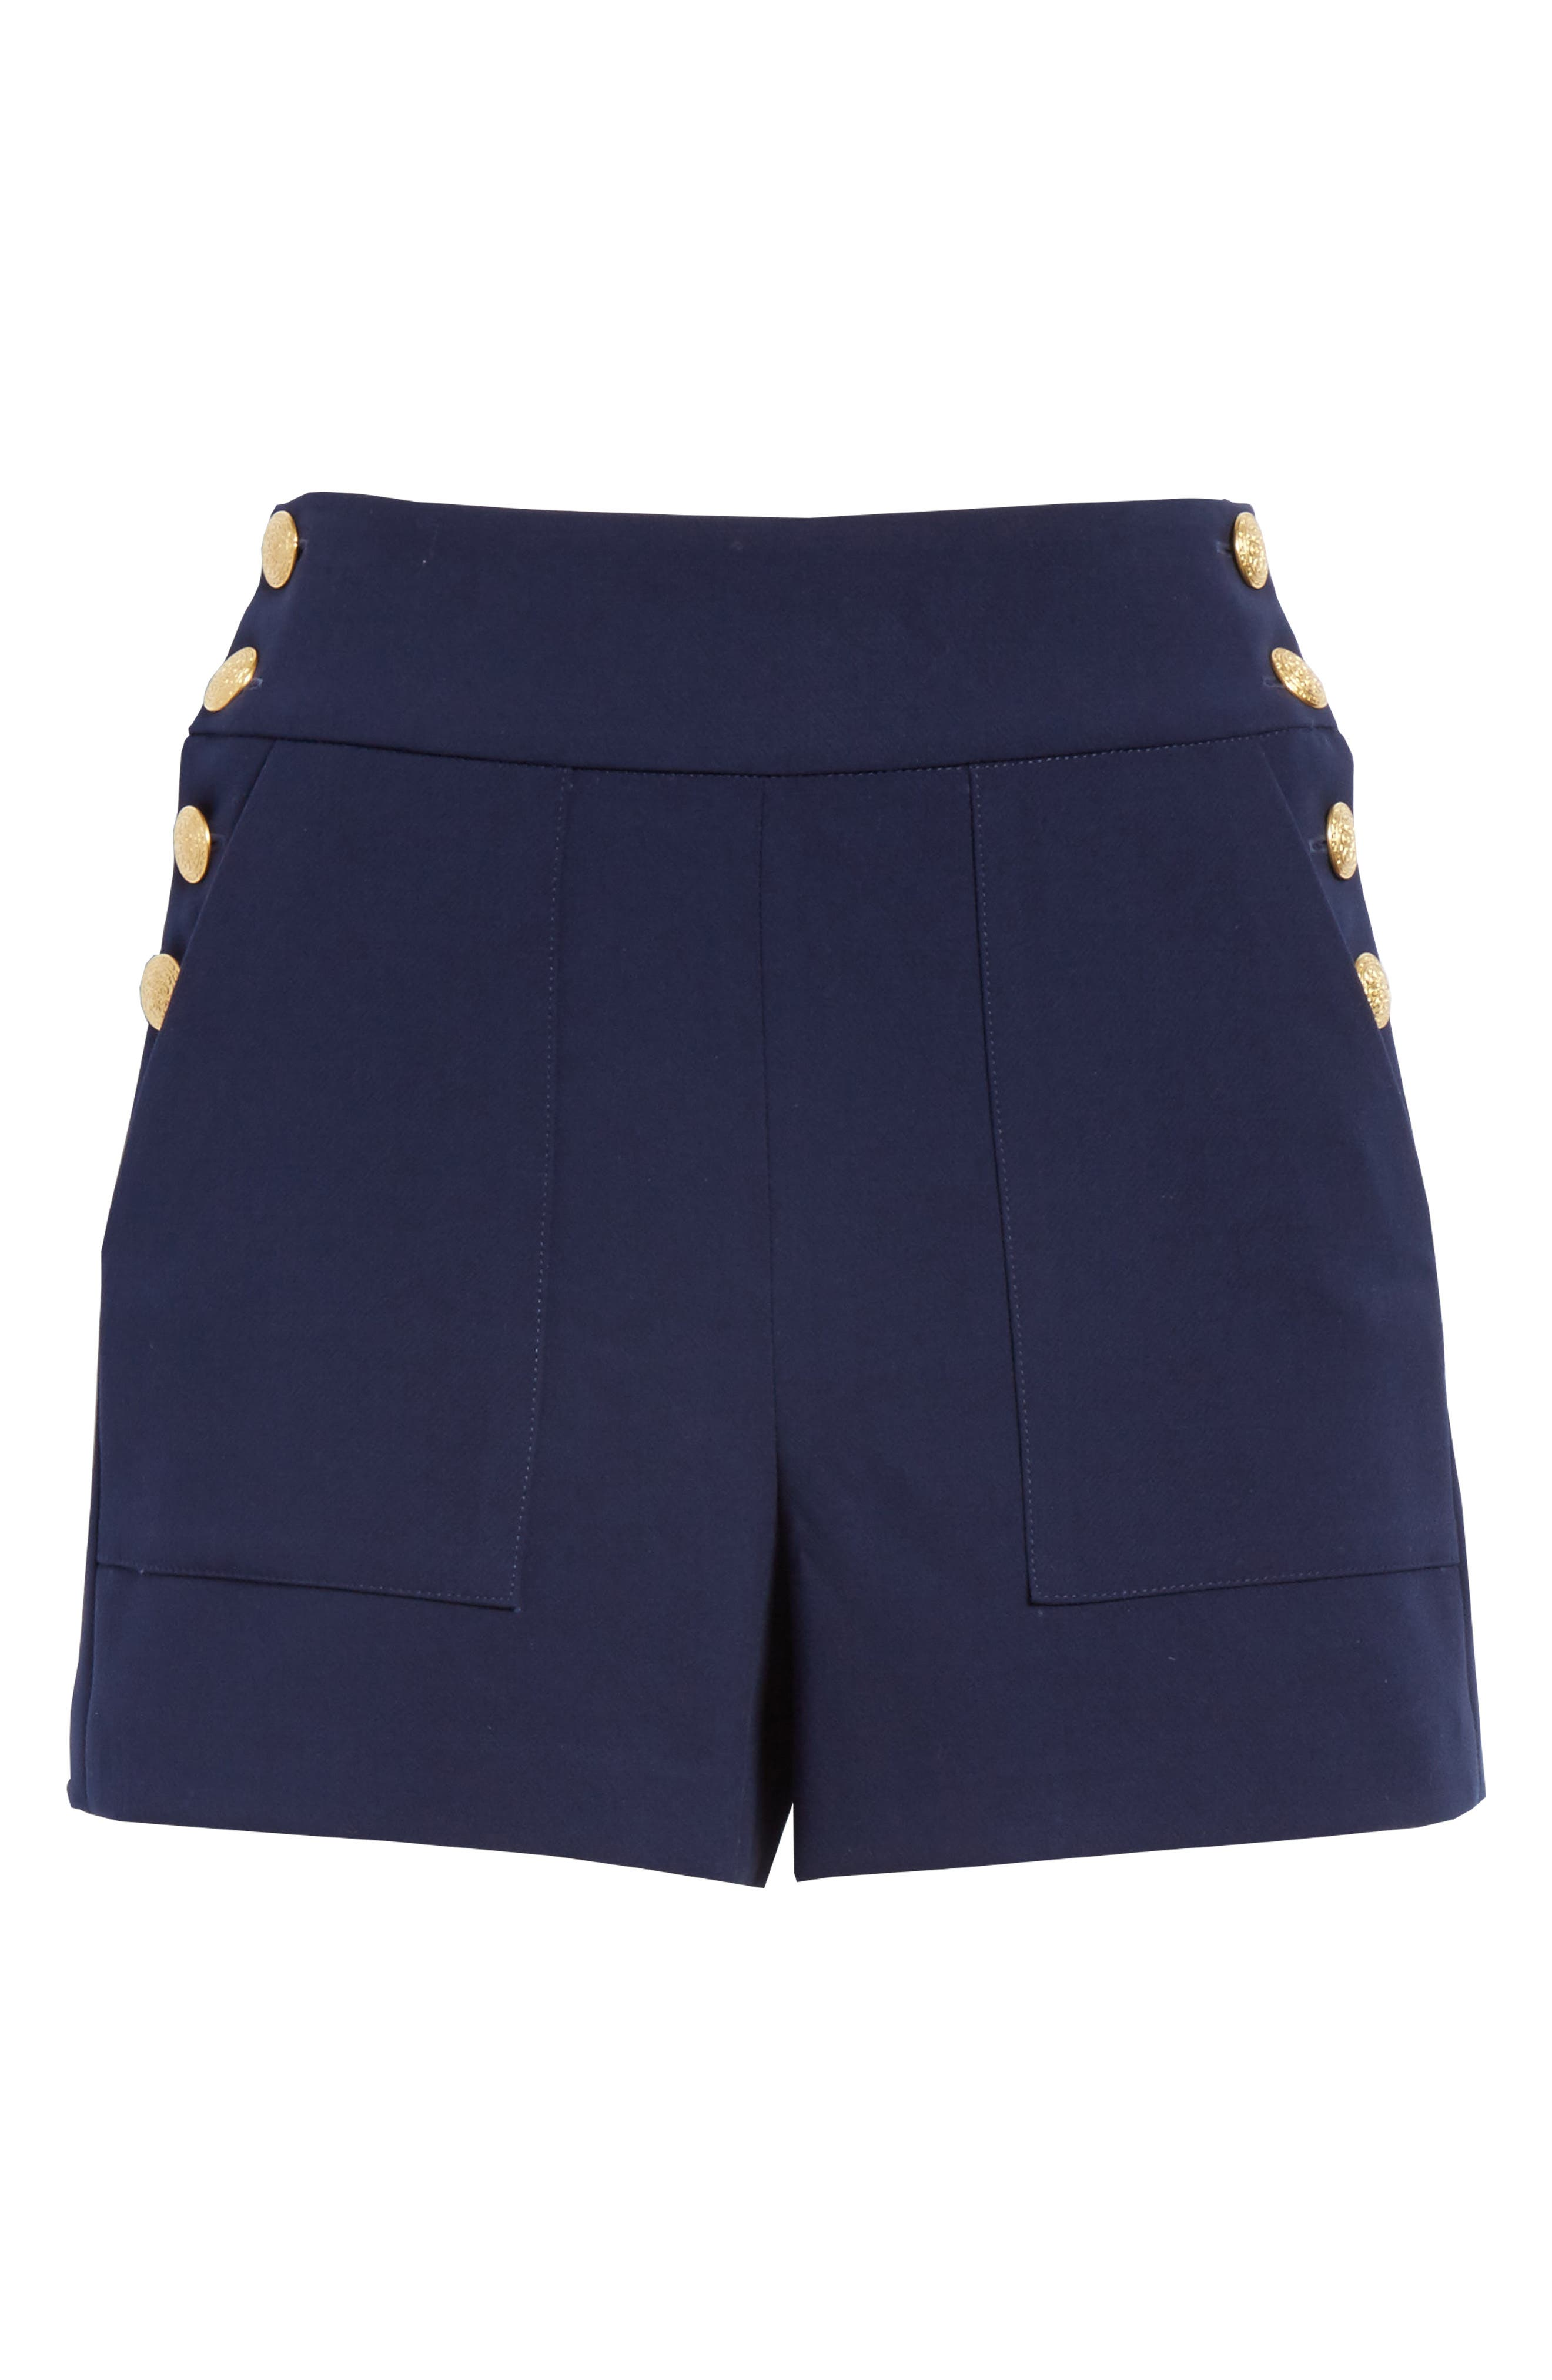 Donald High Waist Sailor Shorts,                             Alternate thumbnail 6, color,                             Sapphire